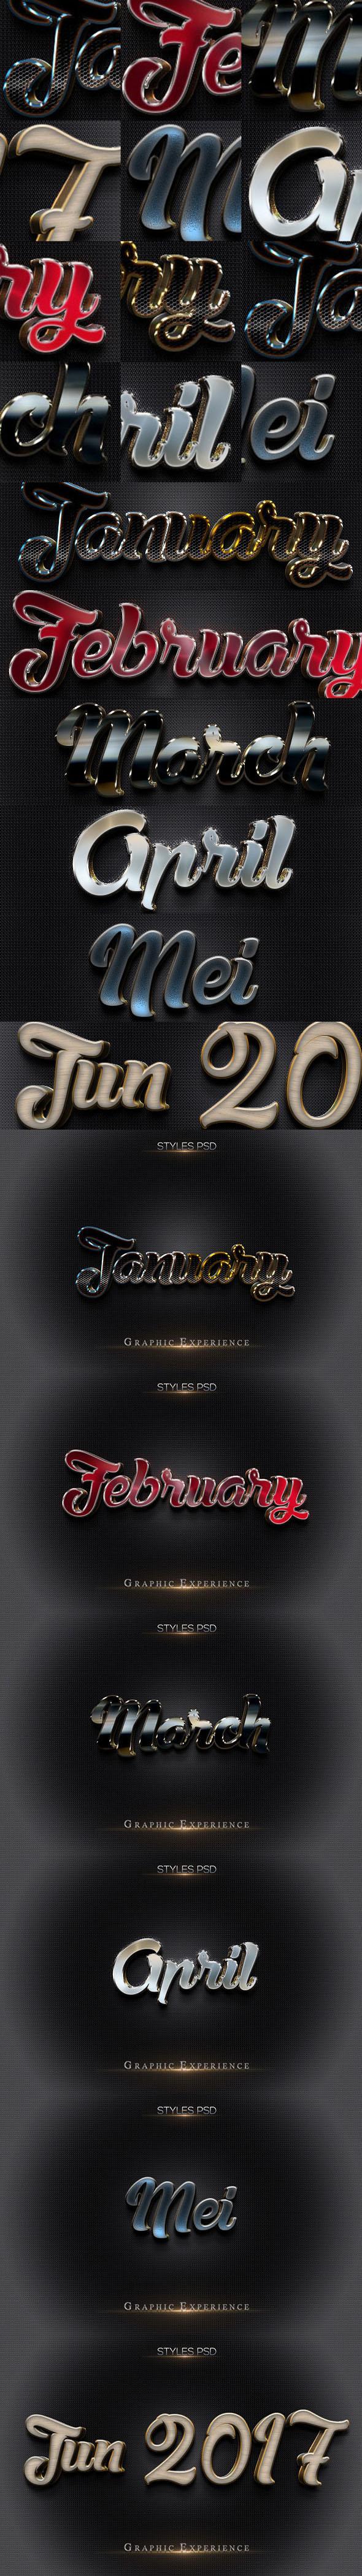 3D Text Effect MockUp 2B_170217 - Styles Photoshop